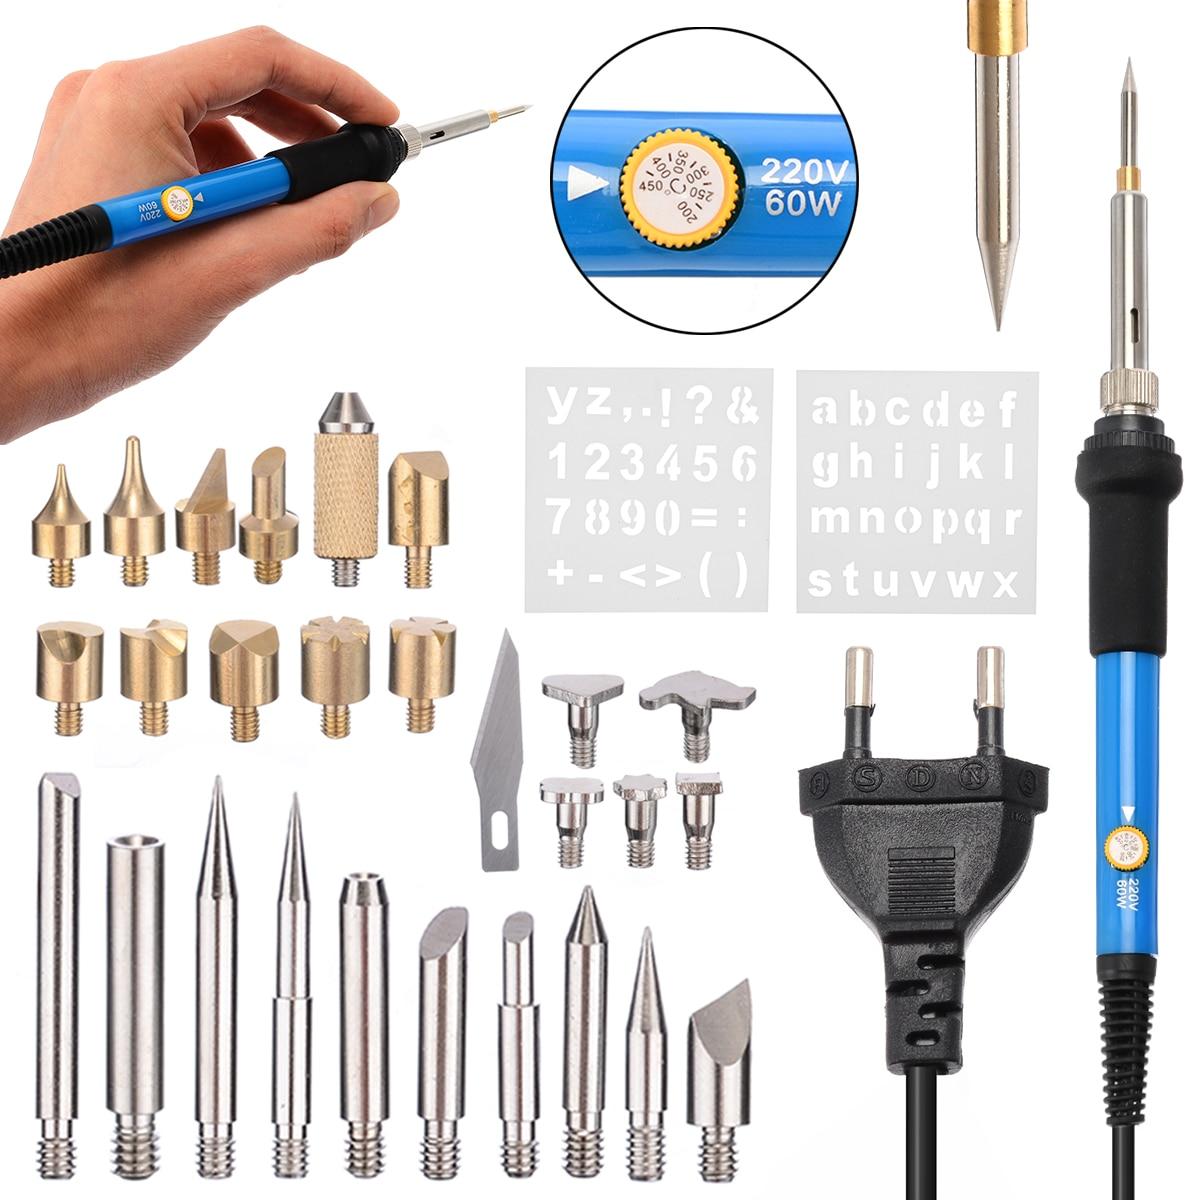 28pcs 60W Wood Burning Kit Carving Pyrography Pen Kit Adjustable Temperature Soldering Iron Welding Wood Embossing